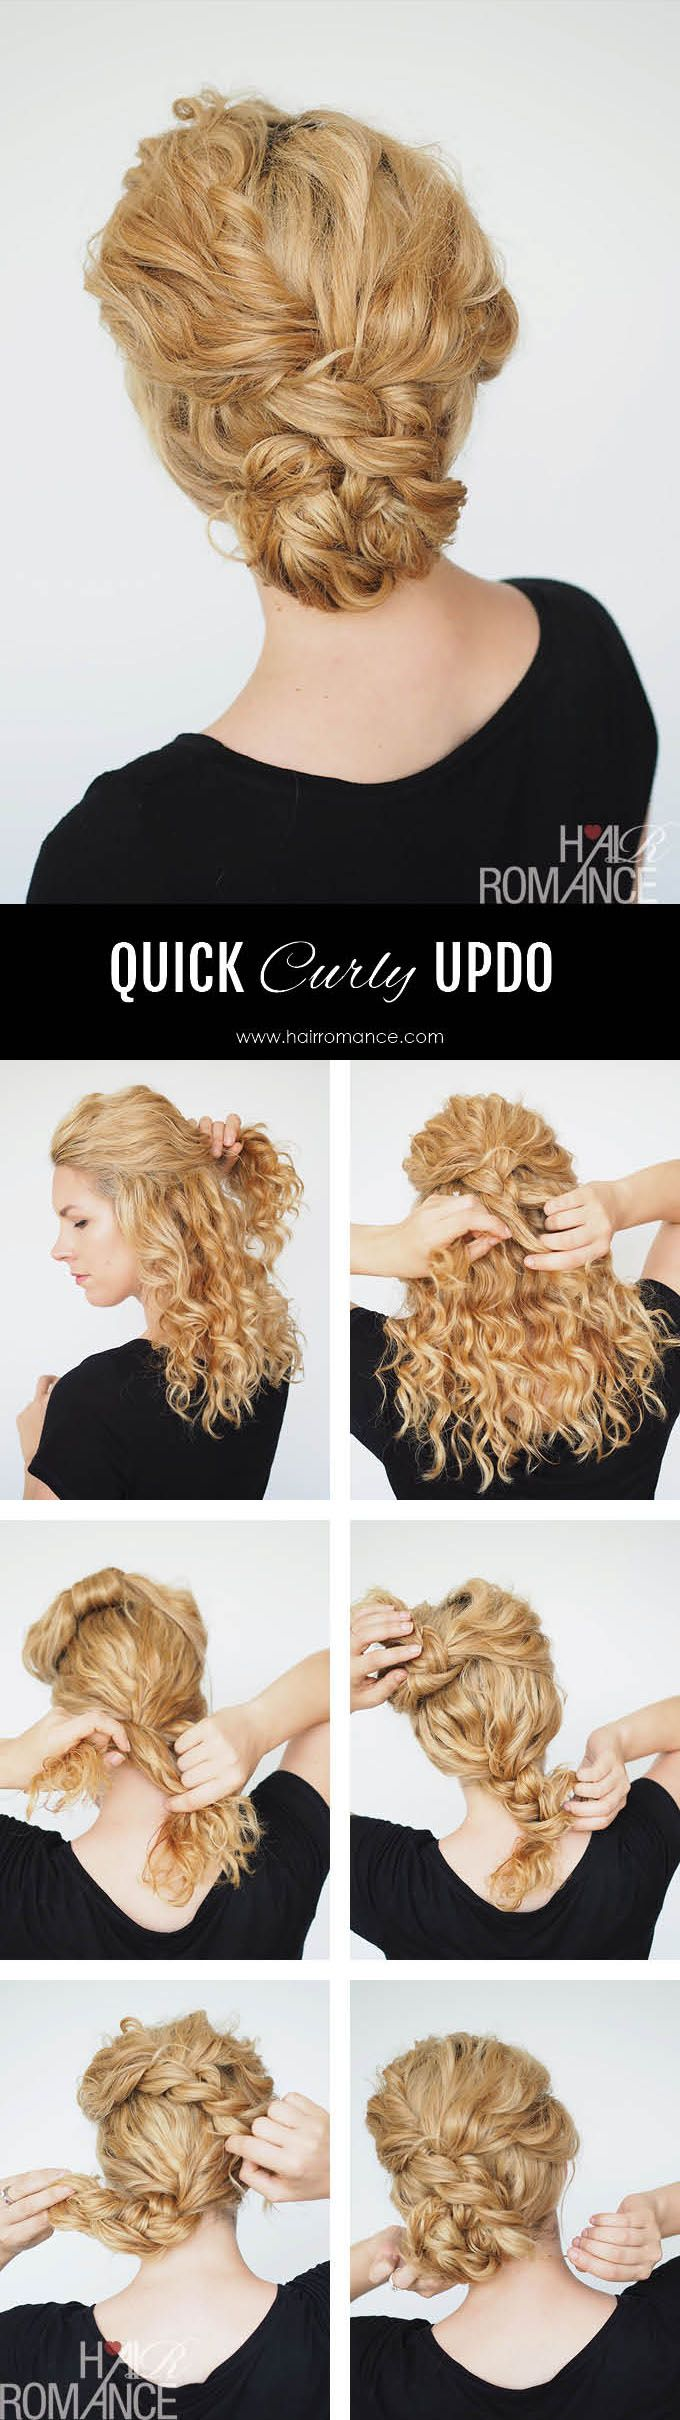 Wedding Updo Tutorial for Curly Hair Wedding Updo Tutorial for Curly Hair new foto